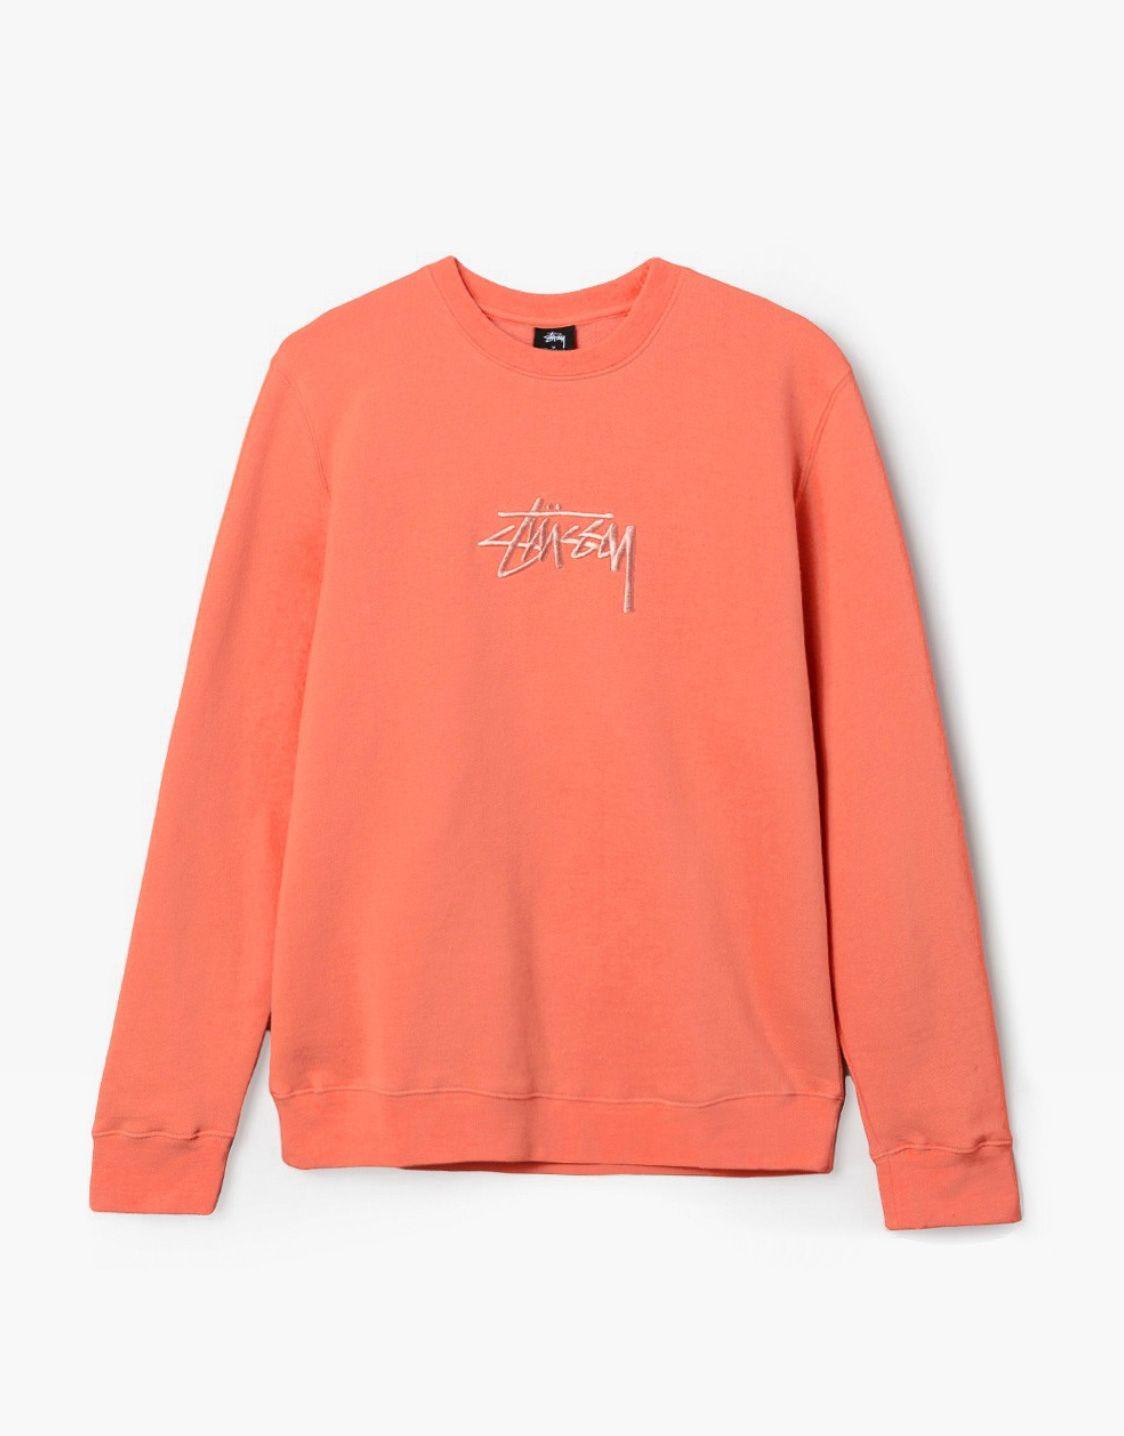 f9c6a5a629a Stussy Stock applique crewneck sweater coral